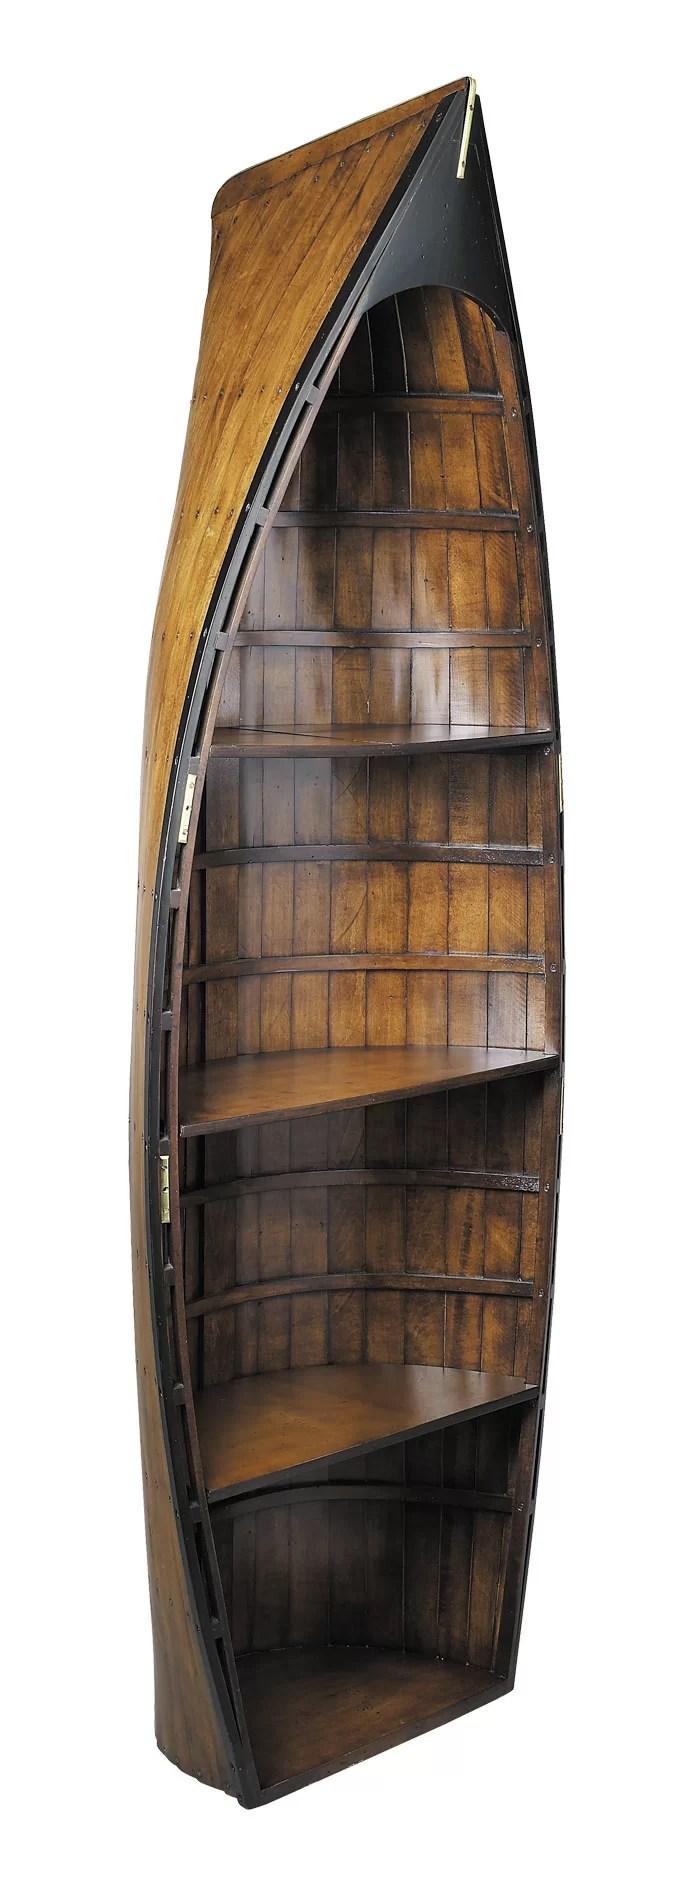 Gig Display Boat Bookcase